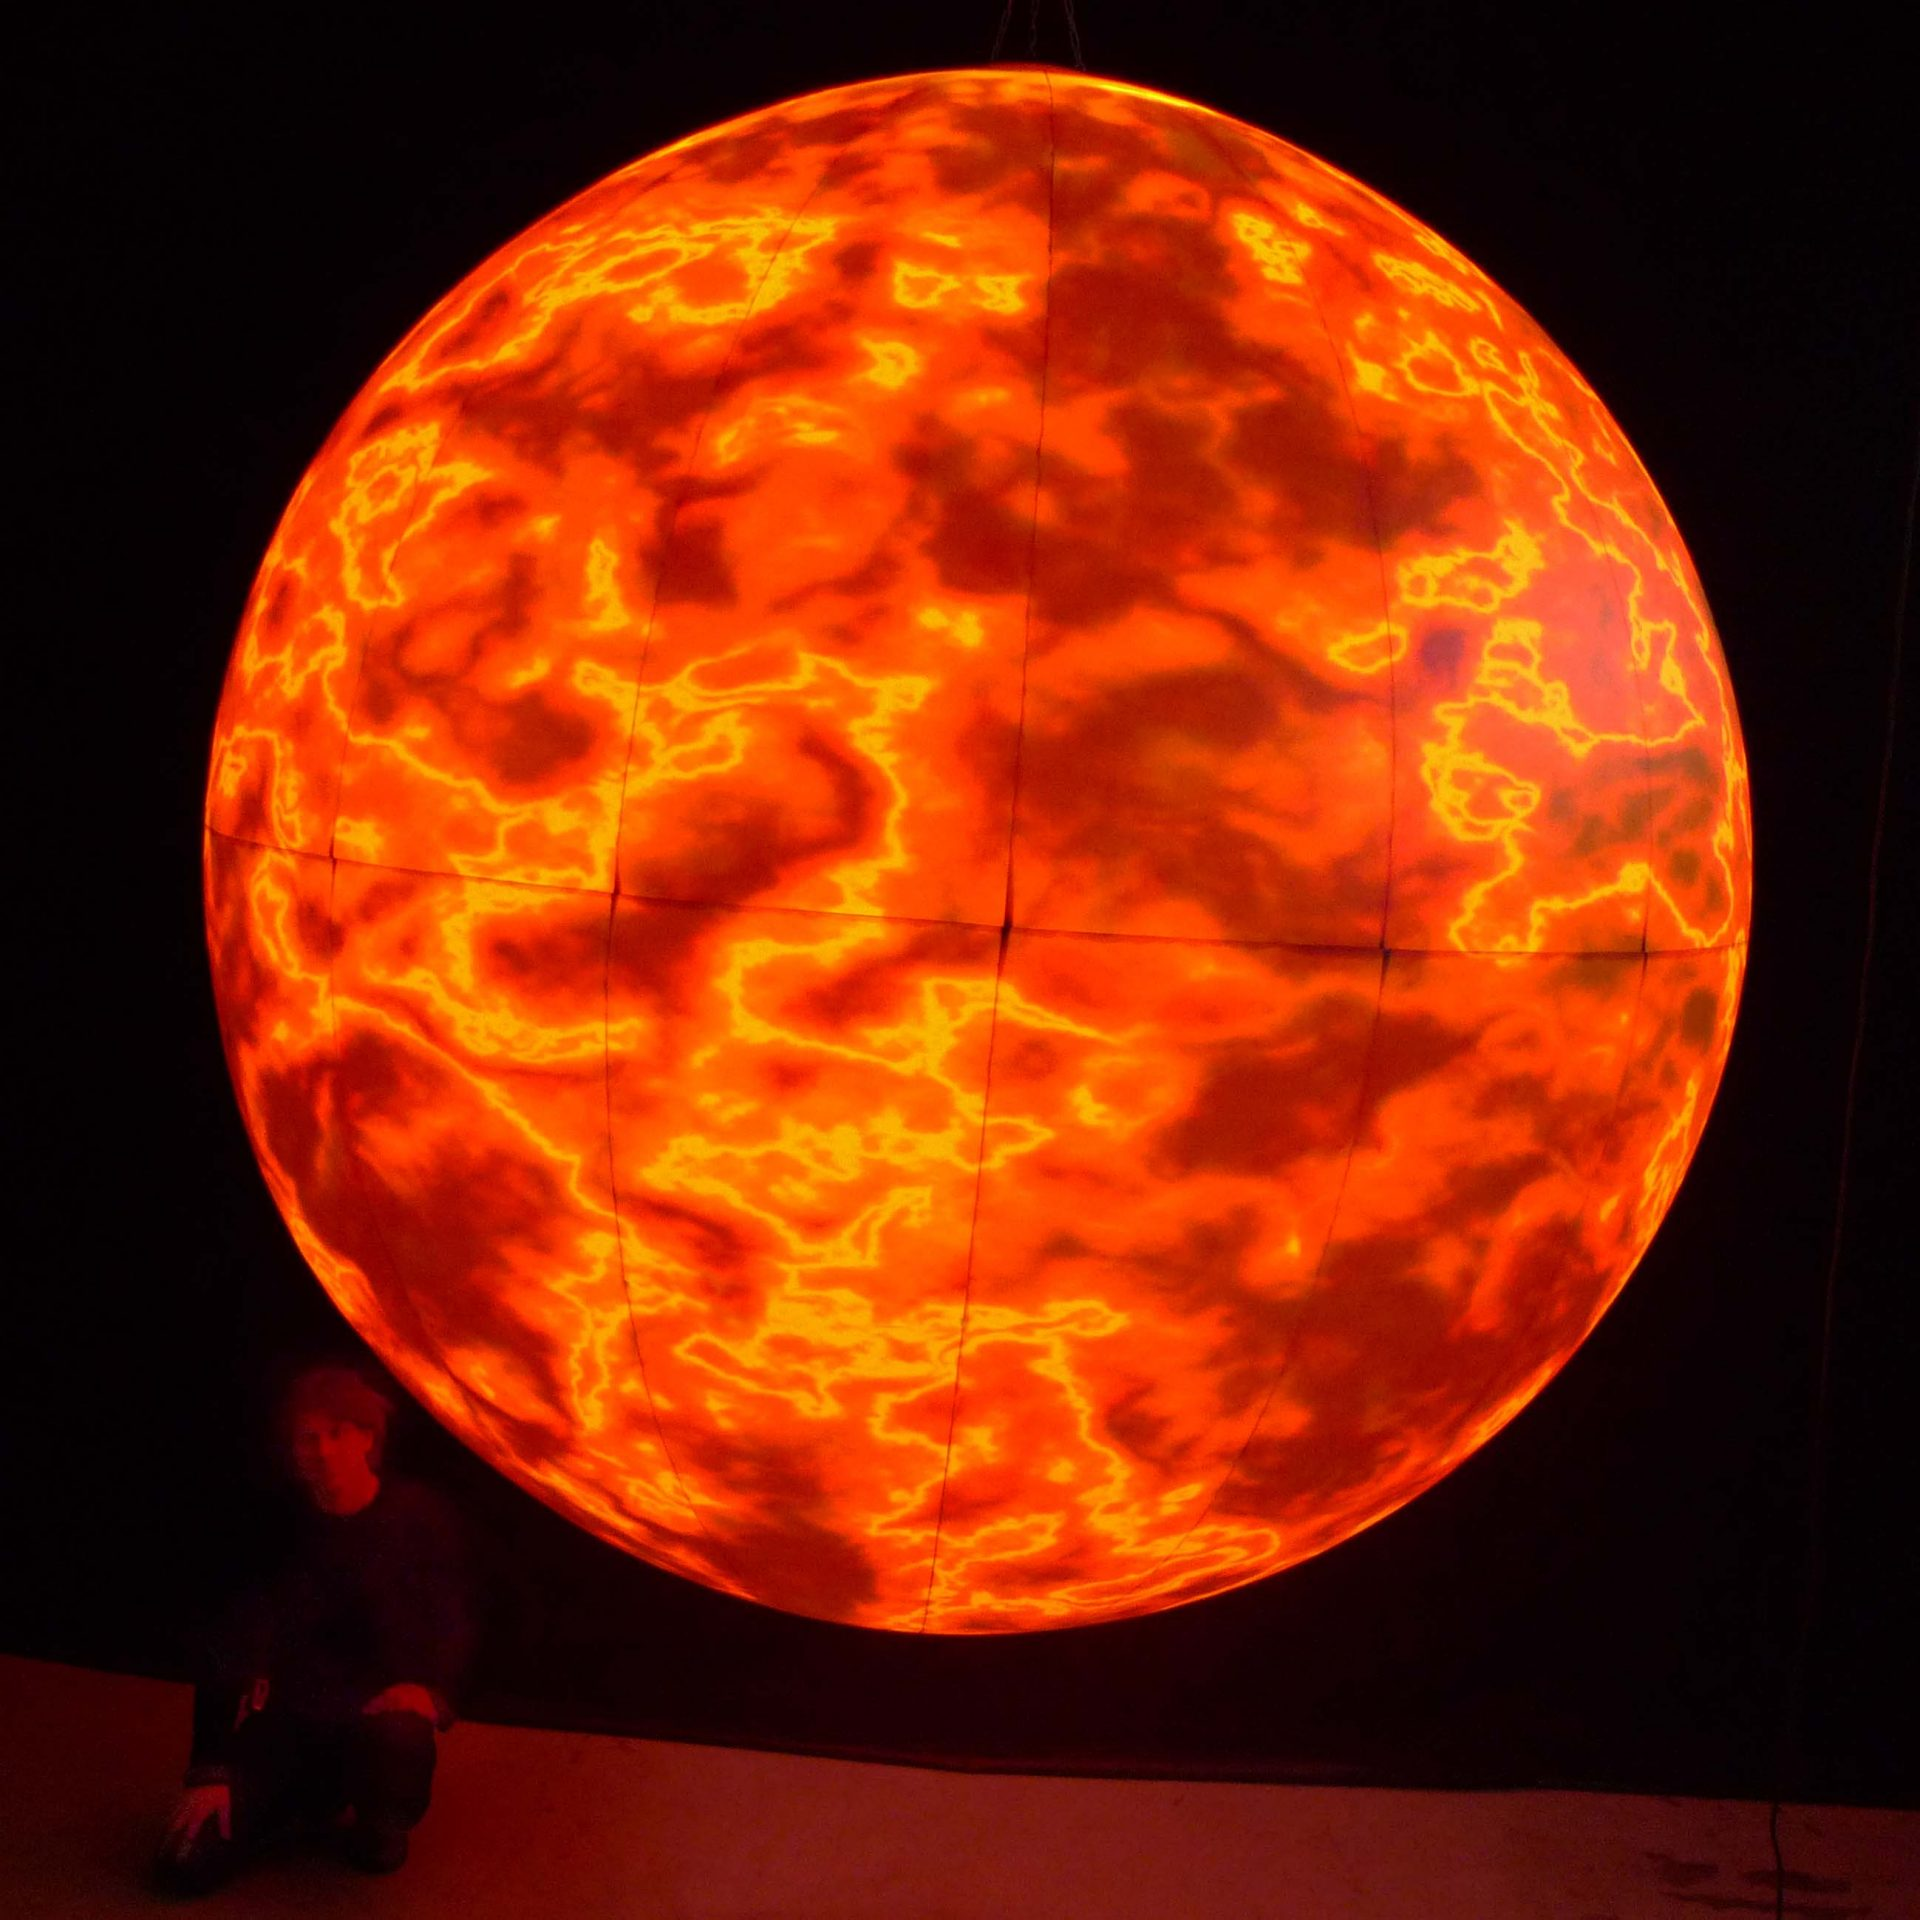 3m lavaball backlit